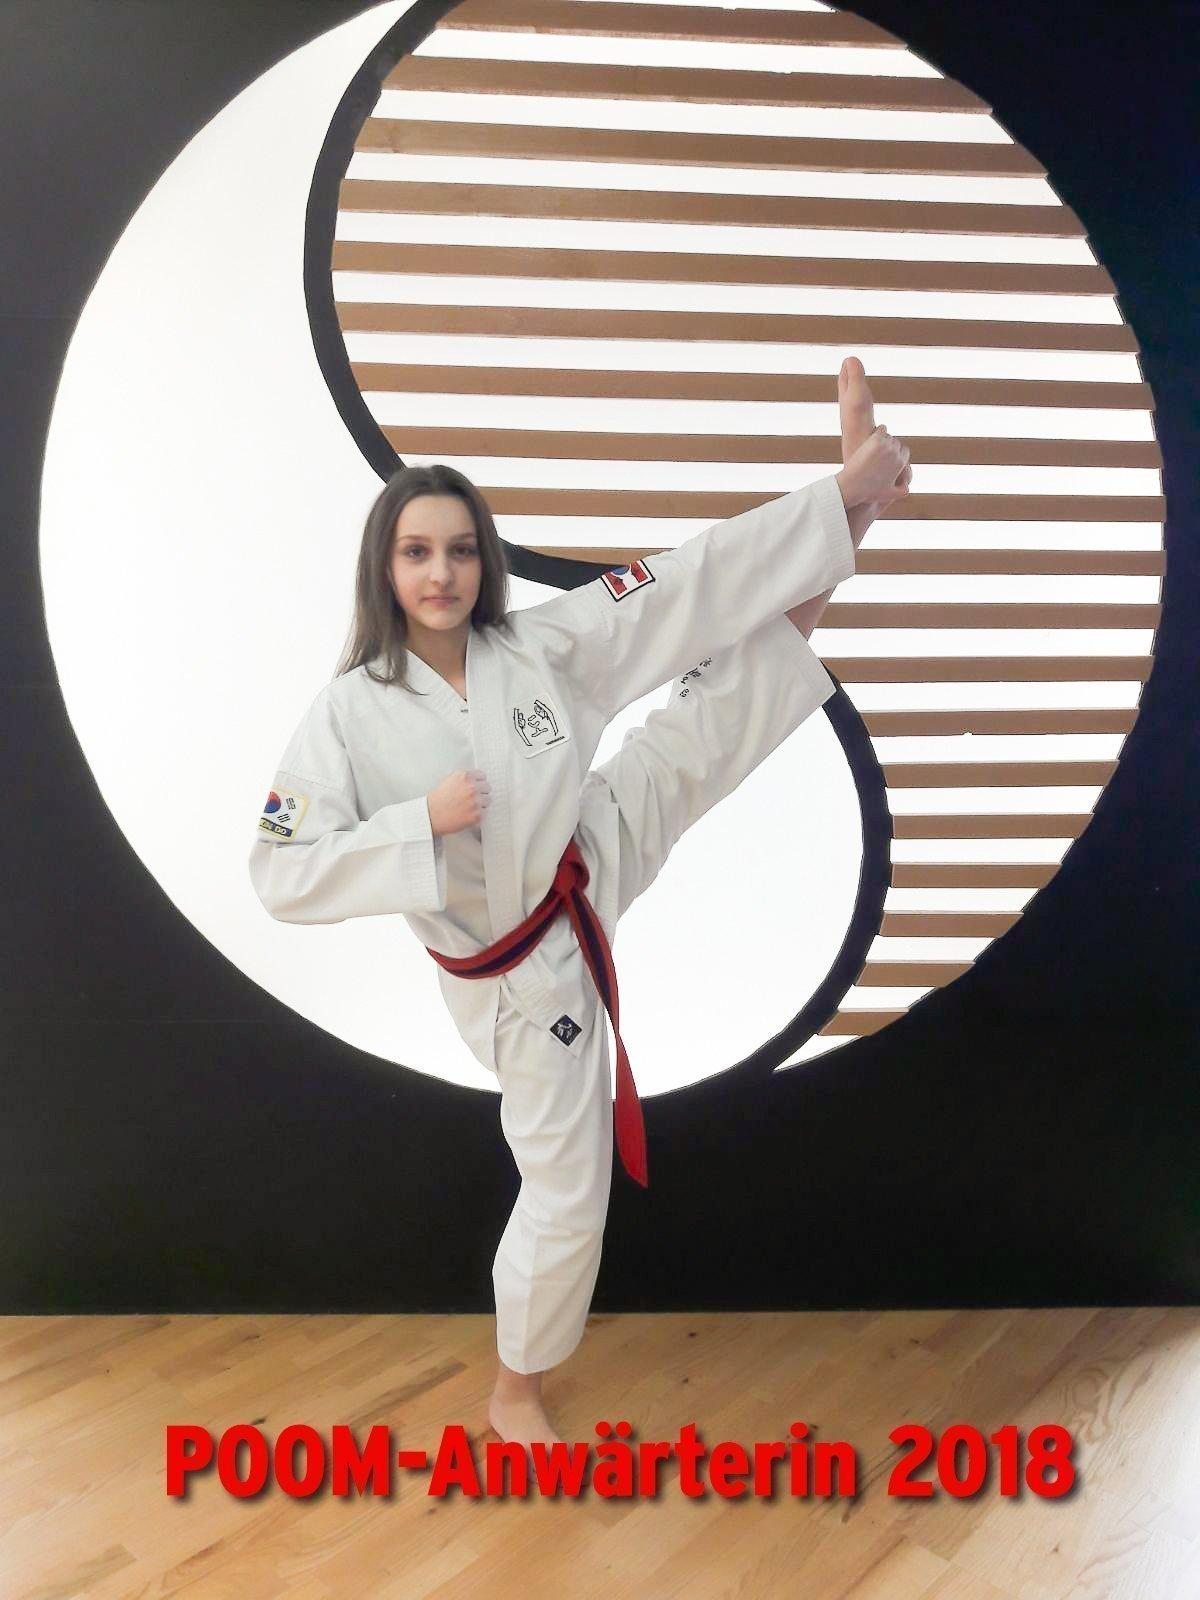 YOUNG-UNG Taekwondo Bulgarien Camp Sanja Despotovic Poom